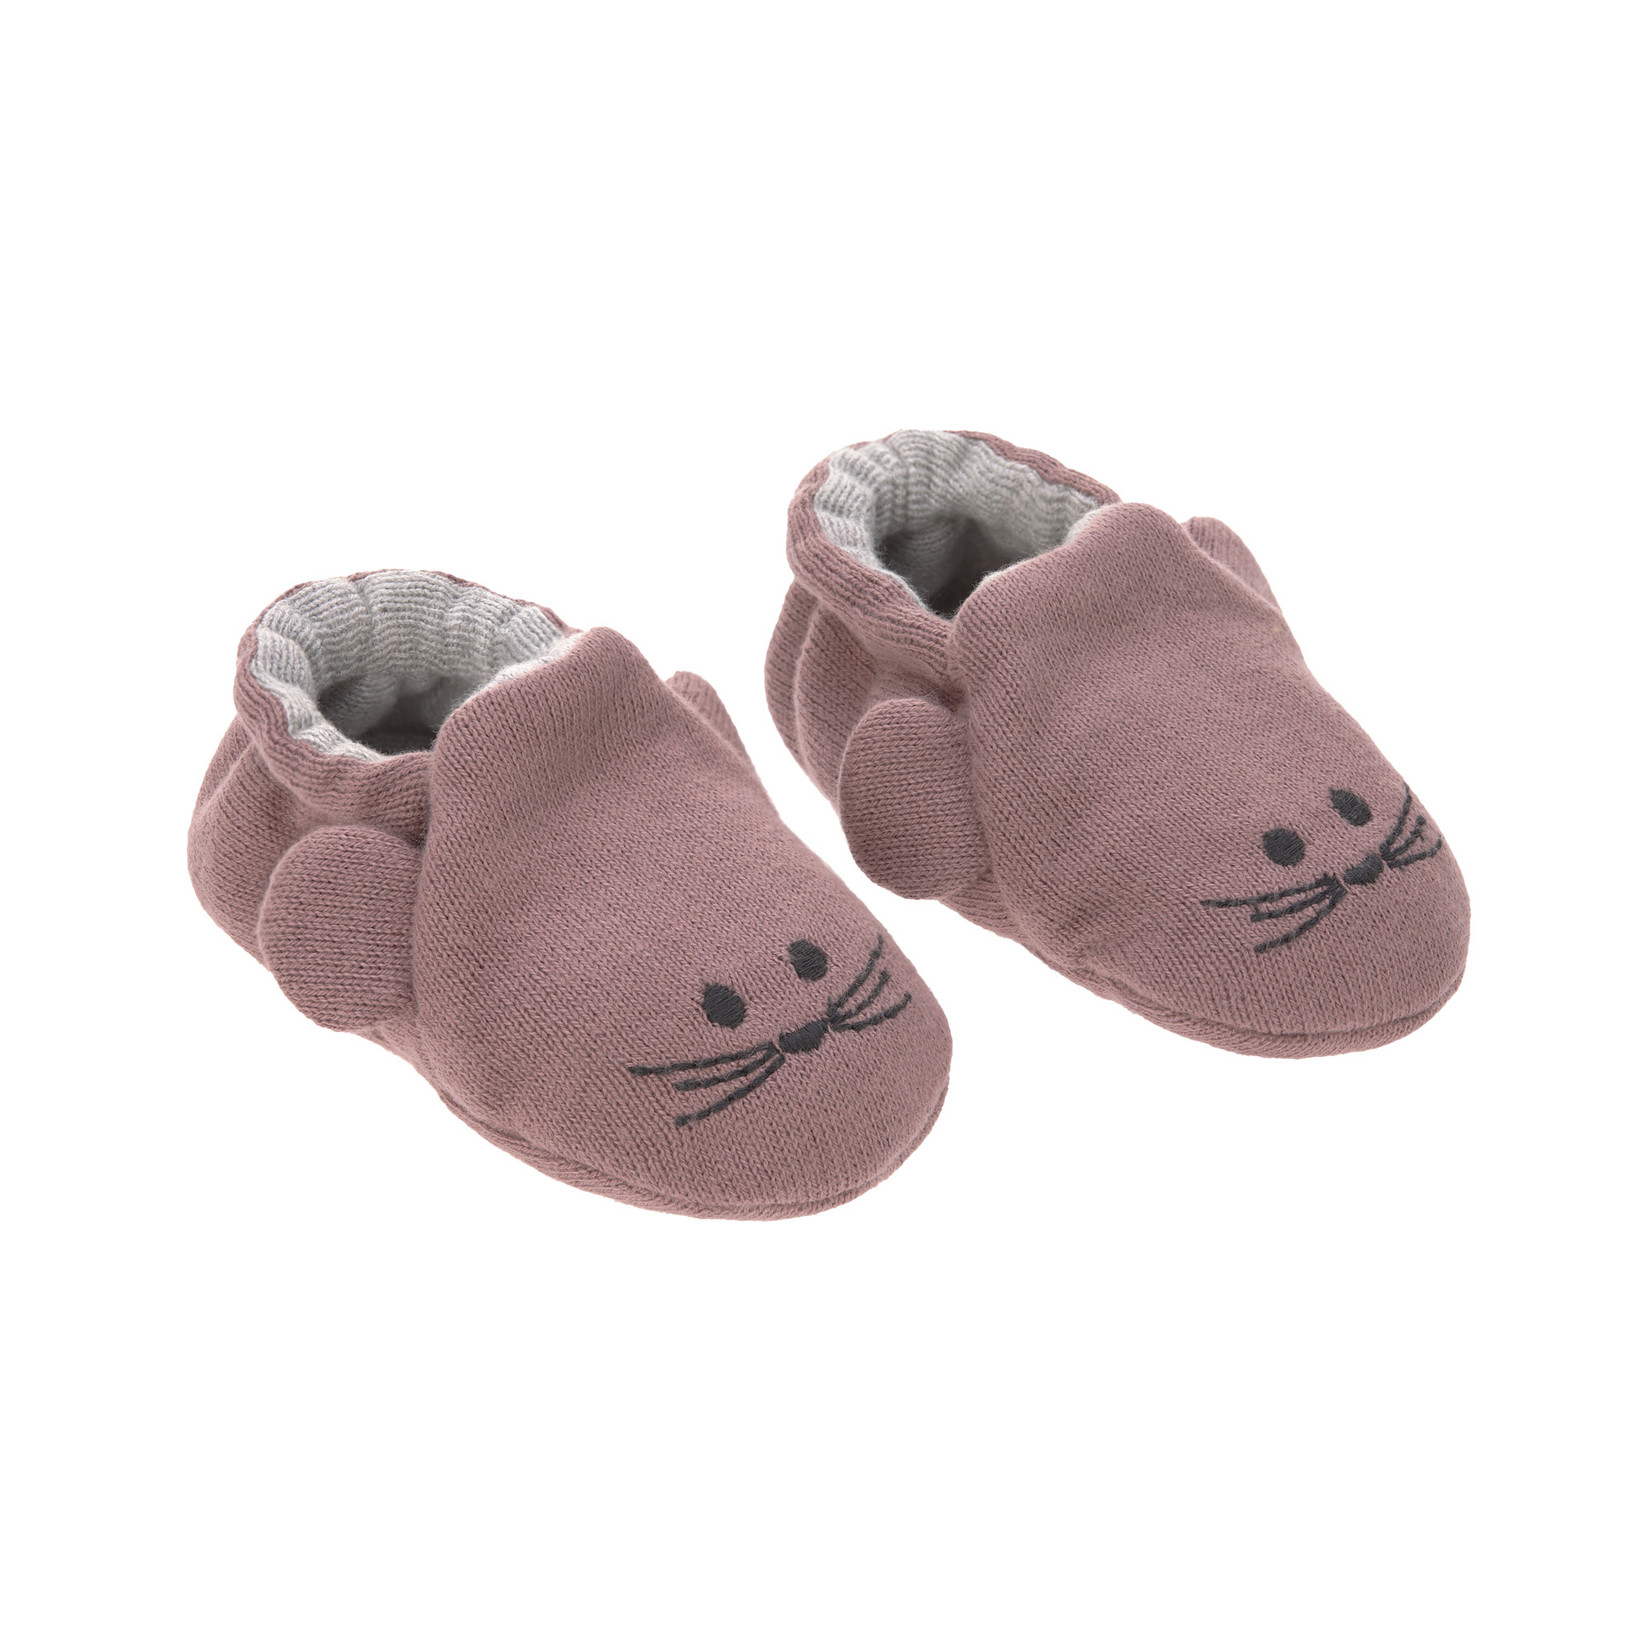 Lässig Lässig Babyschoentjes Gots Little chums mouse One size